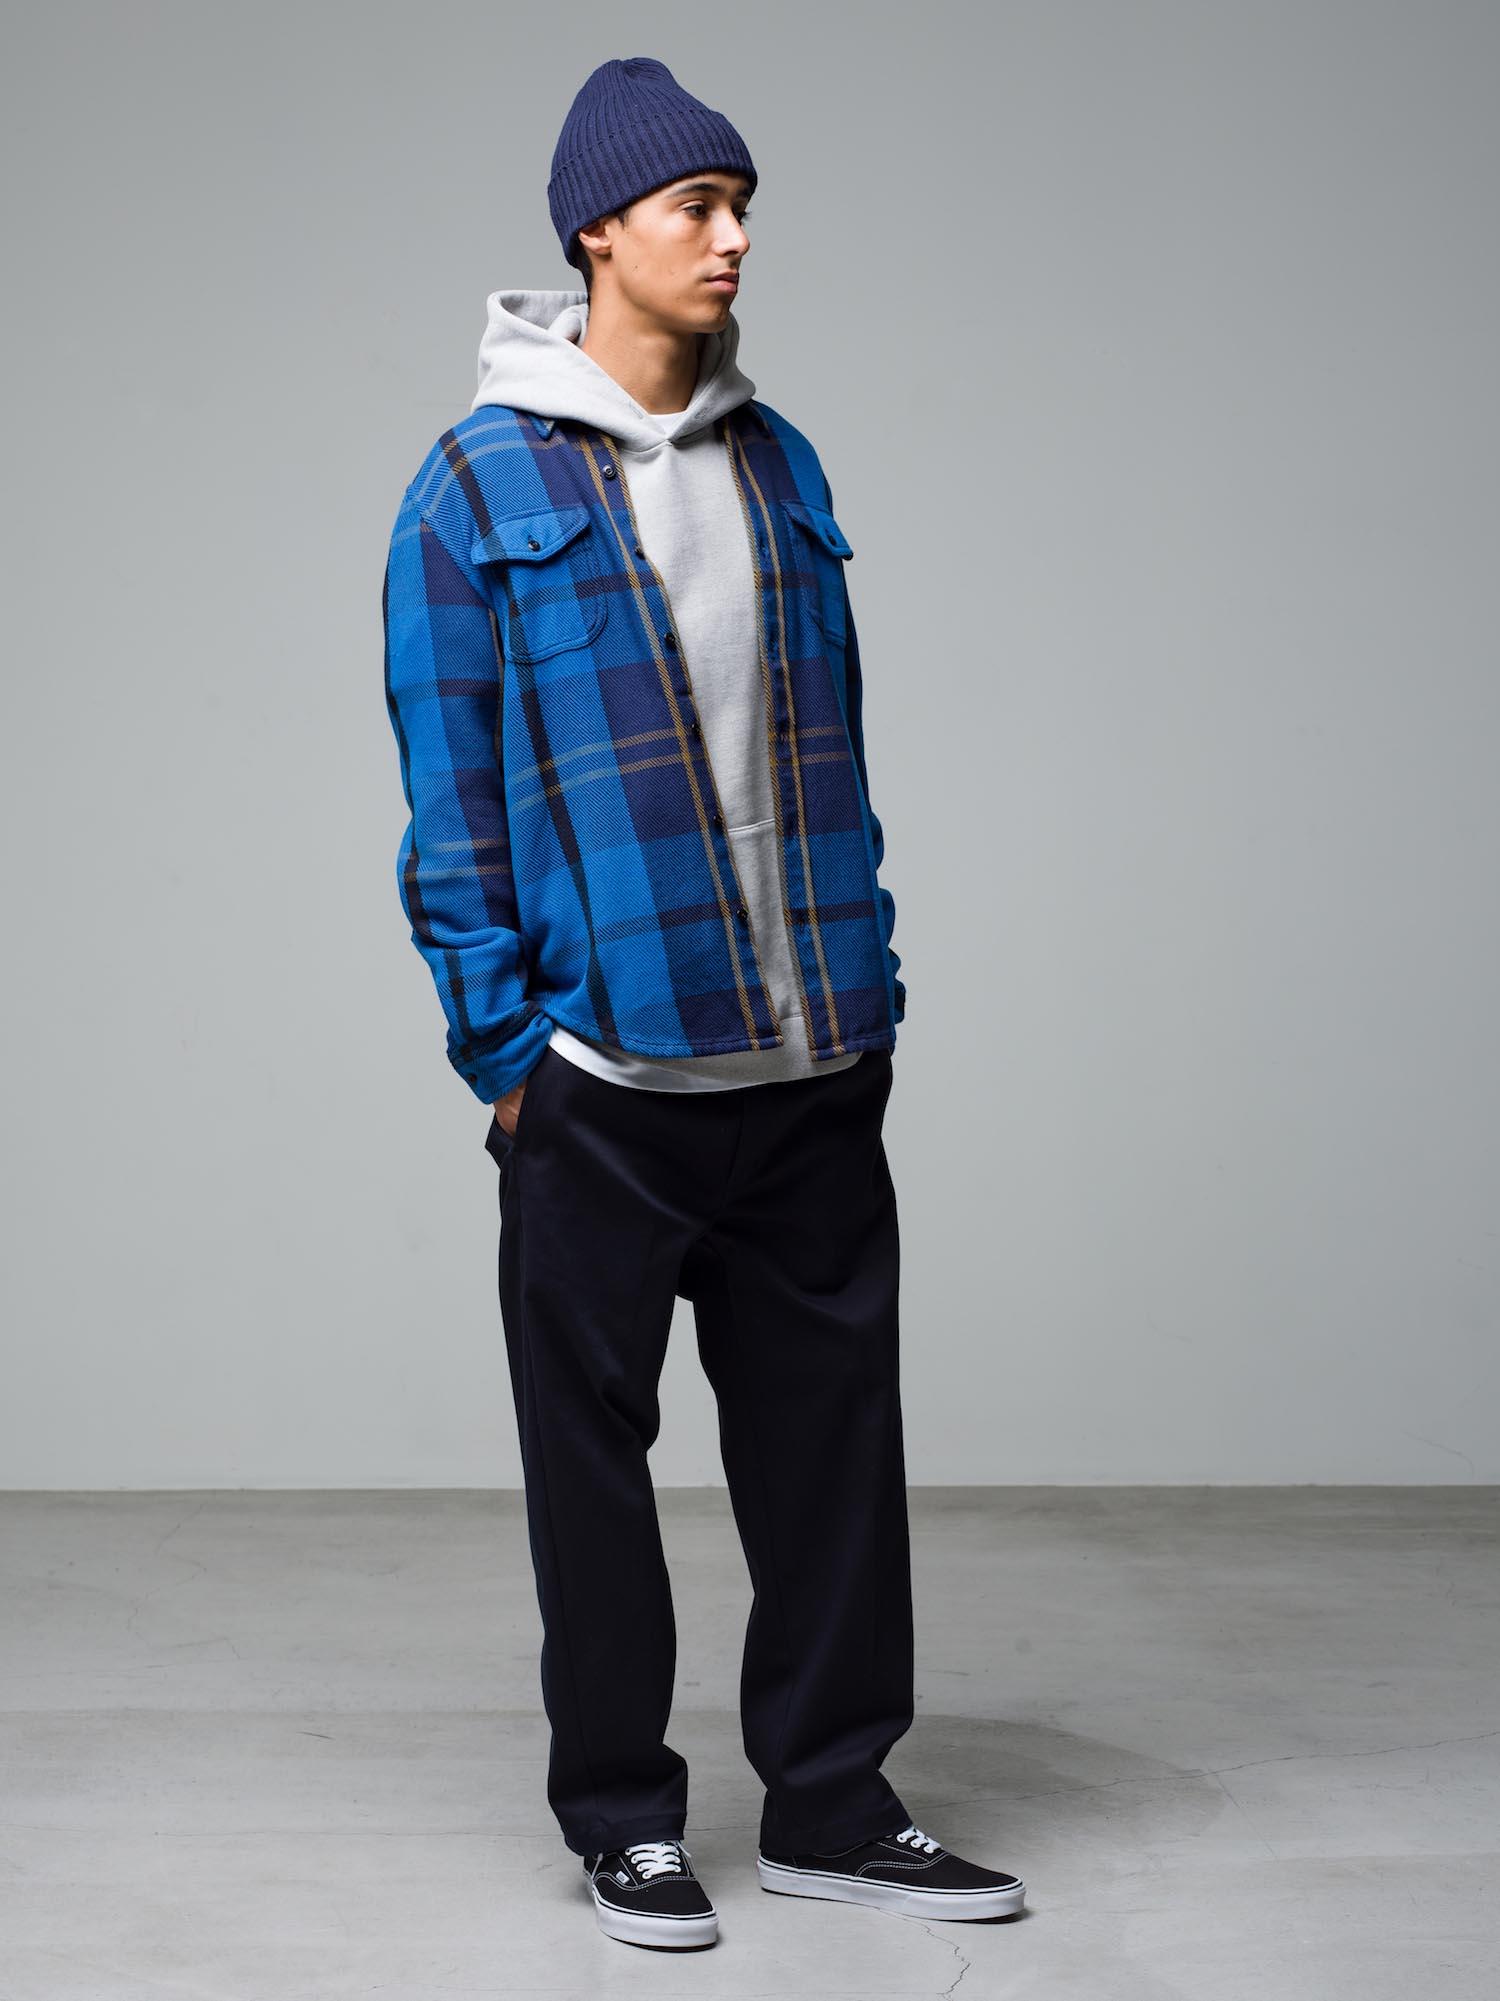 37) Beanie ¥7,700  L/S Shirt ¥28,600  Hoodie ¥25,300  Inner ¥8,800  Pants ¥22,000  Shoes ¥6,050